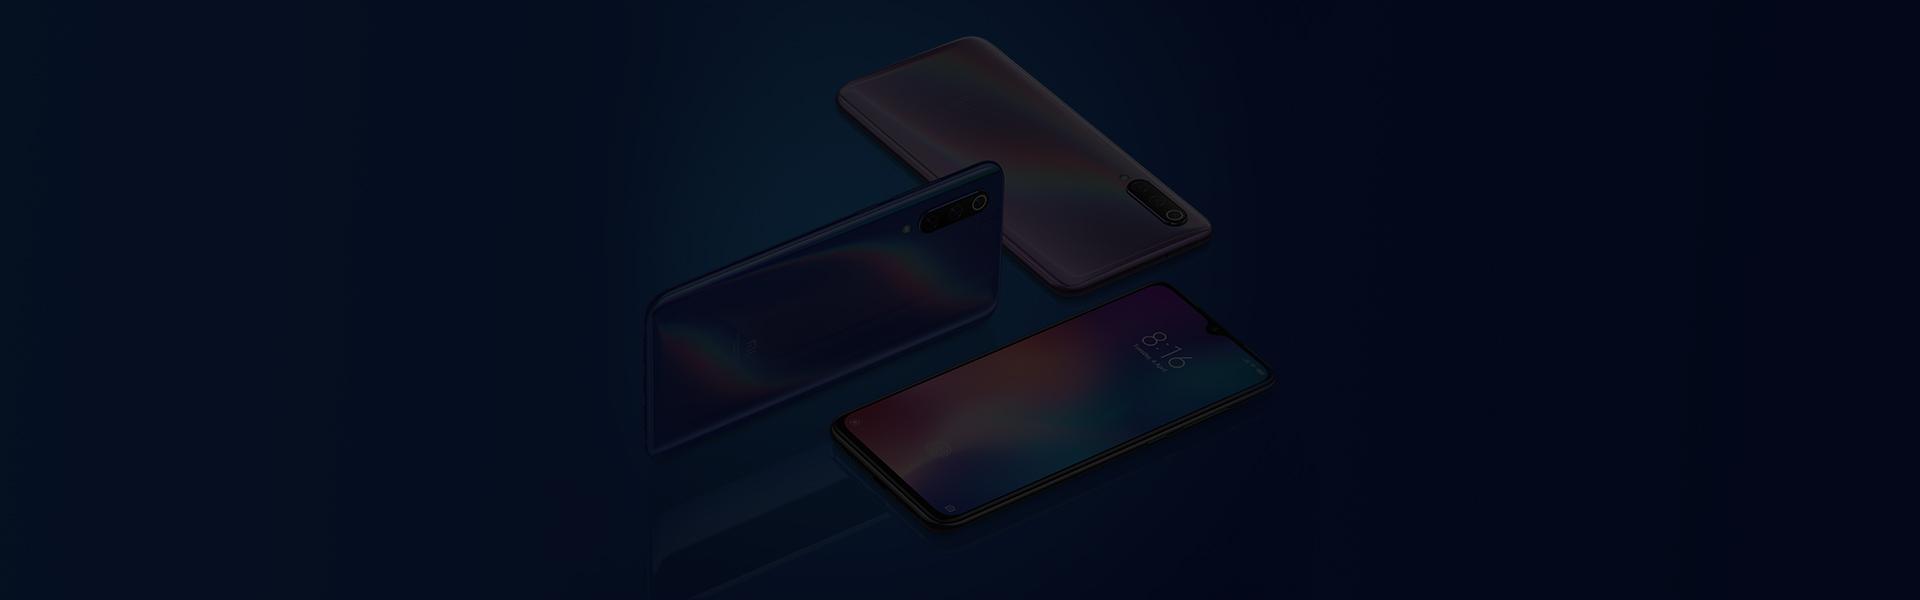 Xiaomi Mi 9 preview: high-end voor weinig